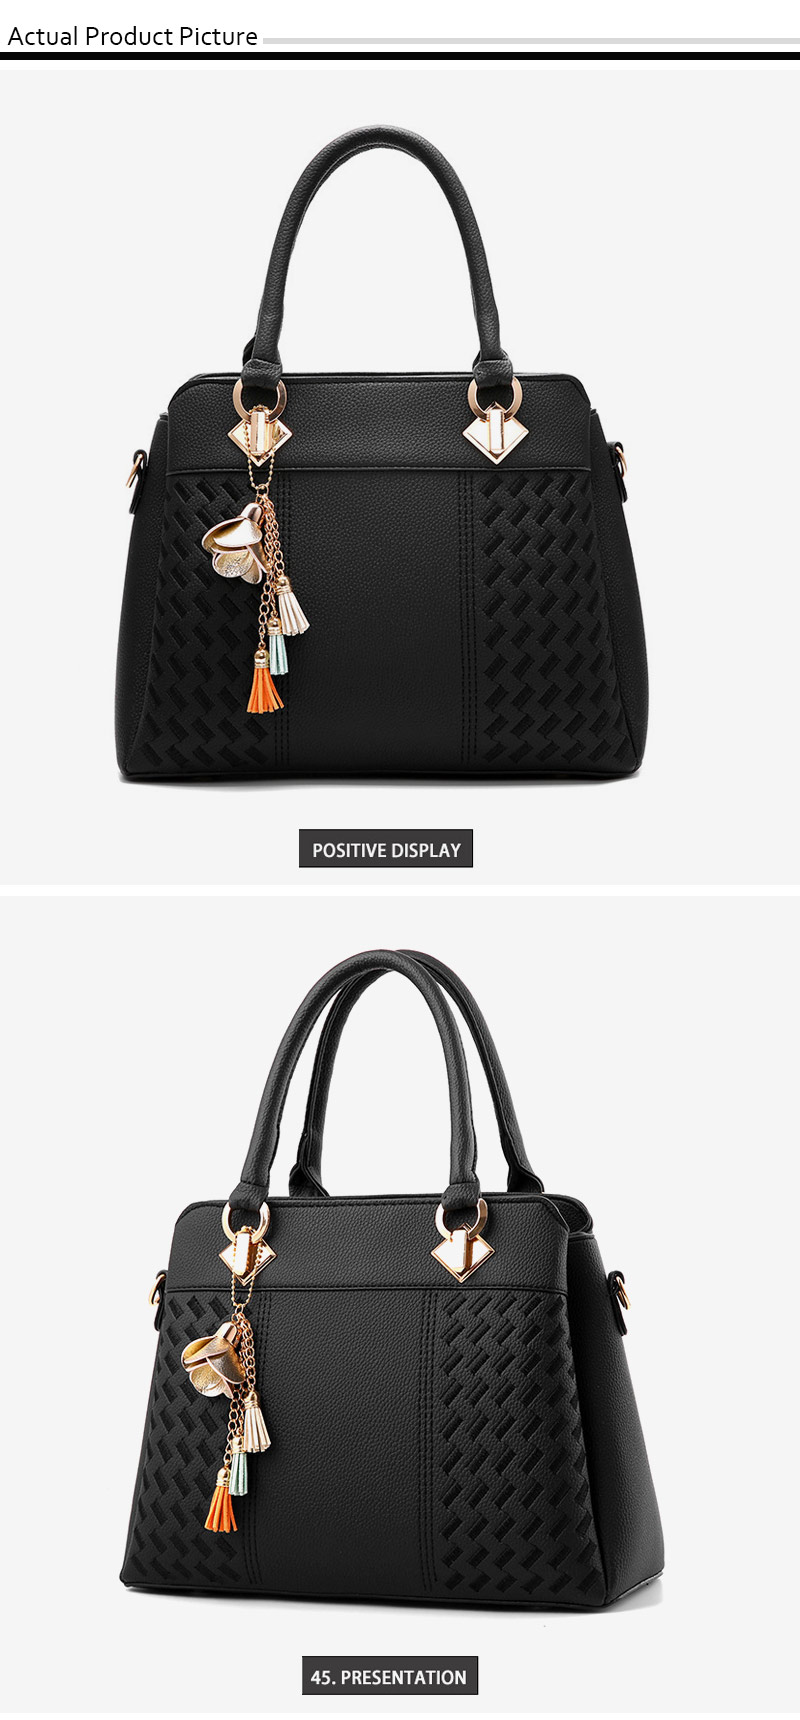 STSR Leather Clutch Bag Female Handbag Luxury Beach Tote Ms. Fringe Shoulder Bag Tote gray one size 15